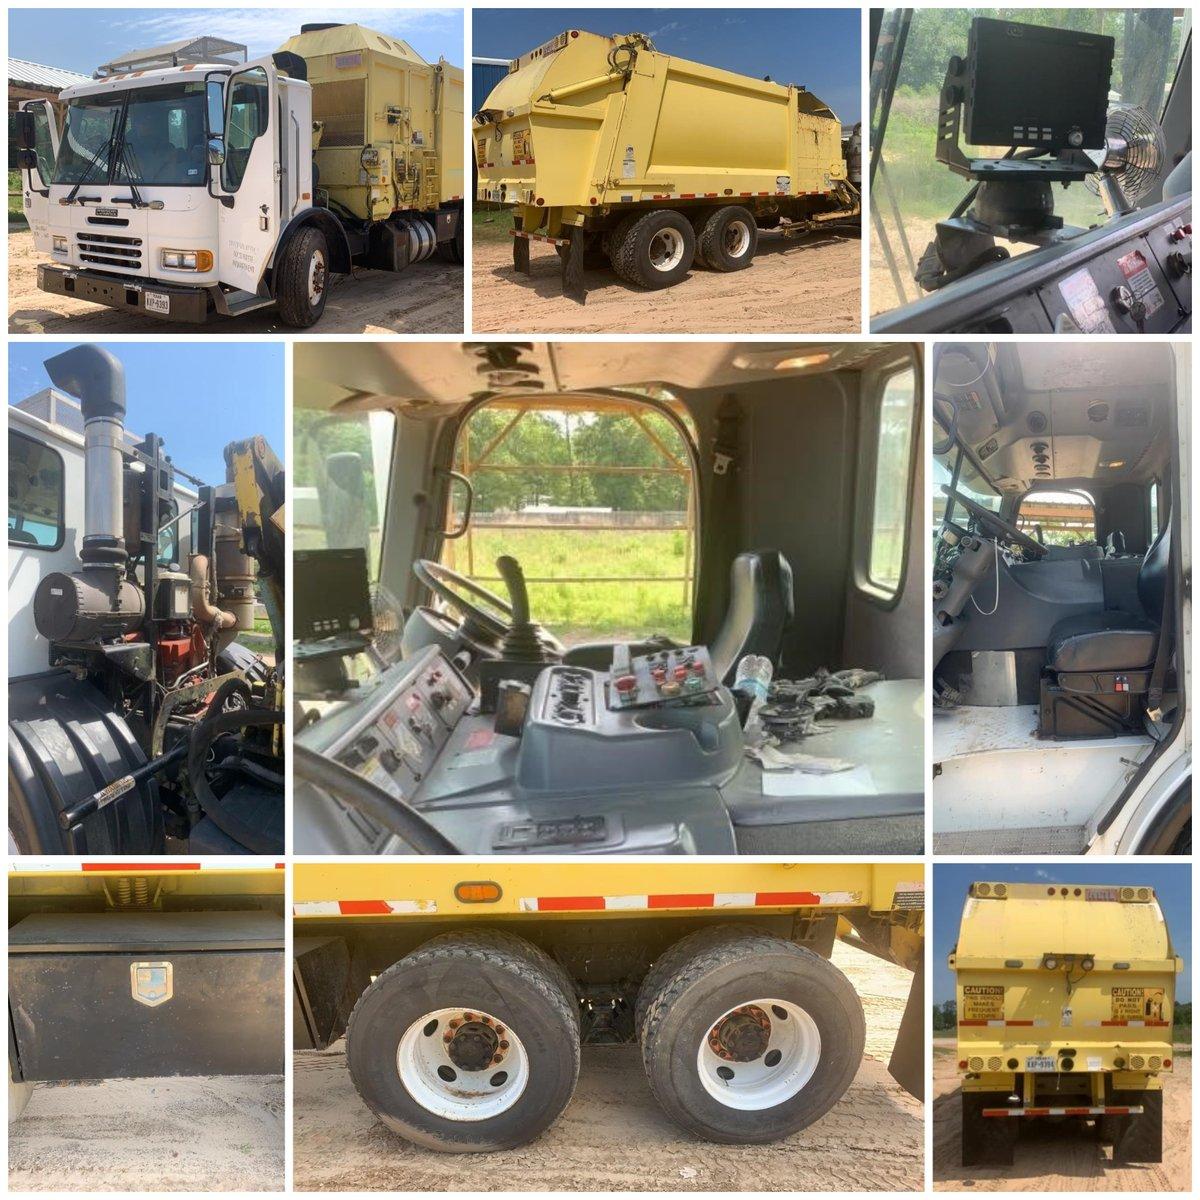 Heavy-Duty Diesel Dump Trucks & MORE!!!  ENDS TONIGHT @ 6pm! https://thetexasauctionhouse.hibid.com/catalog/212035/waste-and-recycling-trucks-and-parts-liquidation/… #cumminsengine #dumptrucksforsale #dumptrucks #flatbedsforsale #houstontx #conroetx #houston #trucksforsale #texastrucks #onlineauction #americanlafrance #garbagetrucksforsale #heavydutytruckspic.twitter.com/sh43O01N3L